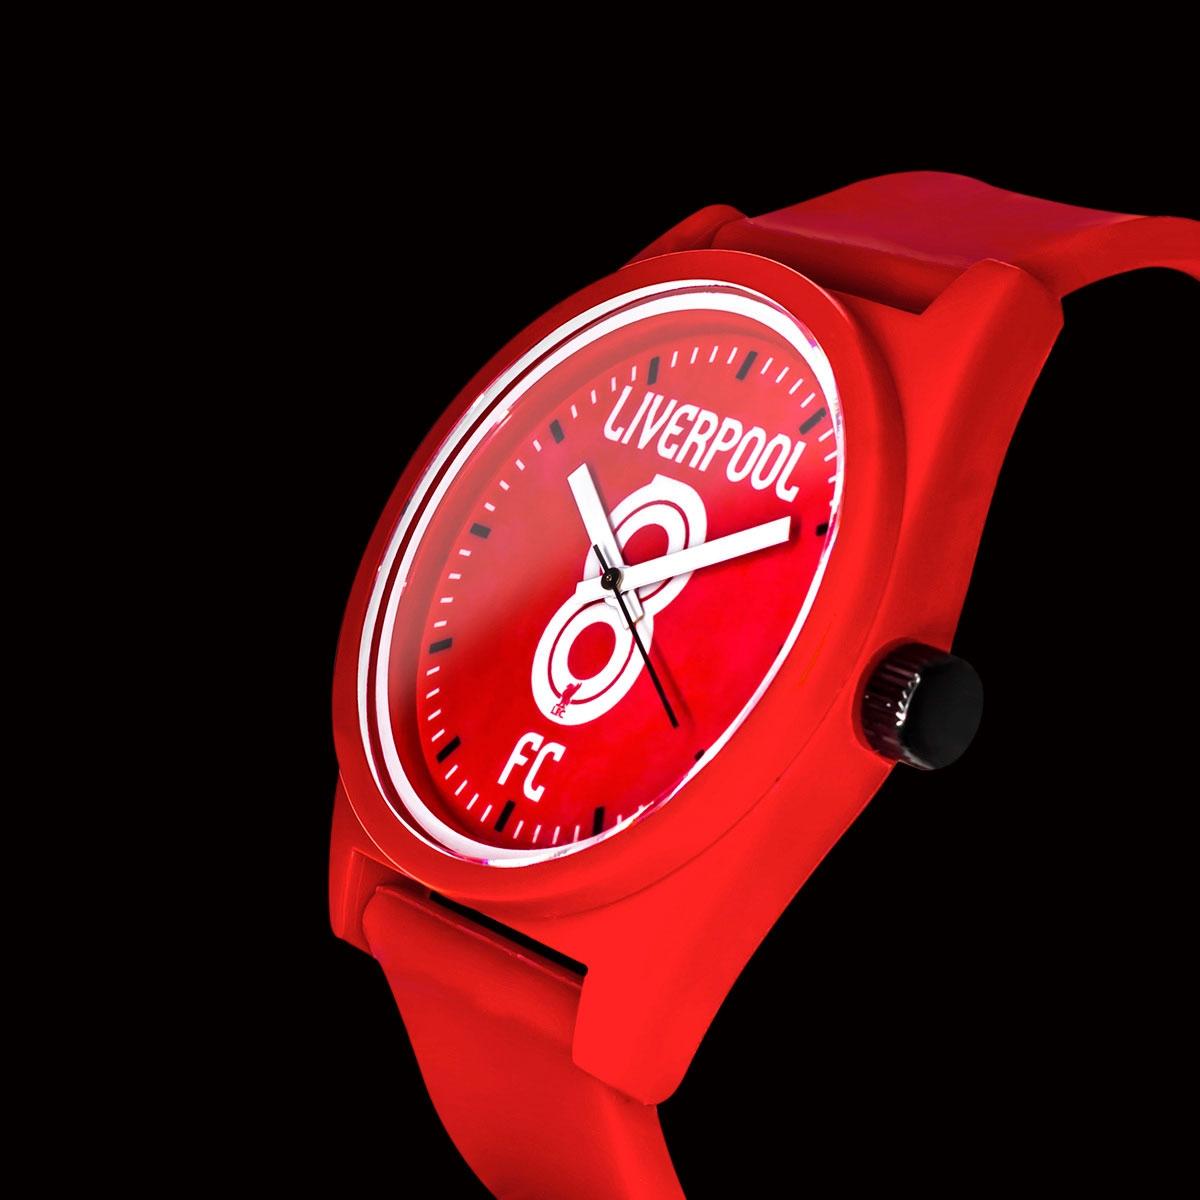 Kop Liverpool FC Watch 4